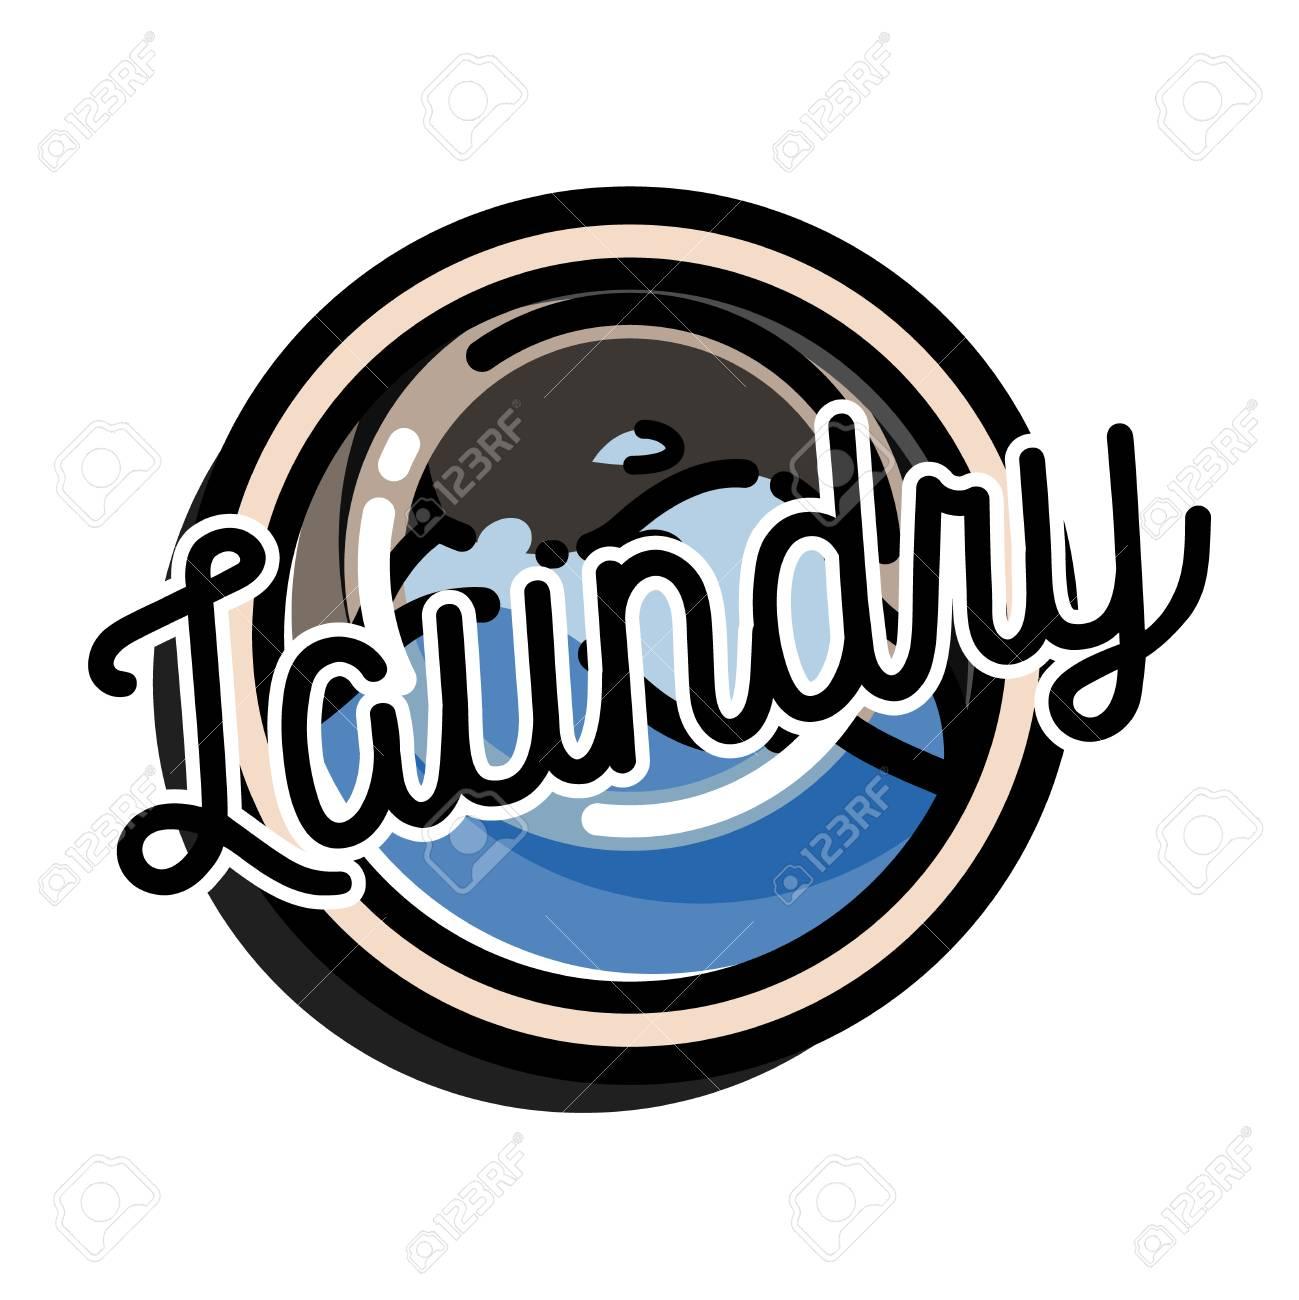 Color Vintage Laundry Emblem For Your Design Vector Illustration Stock